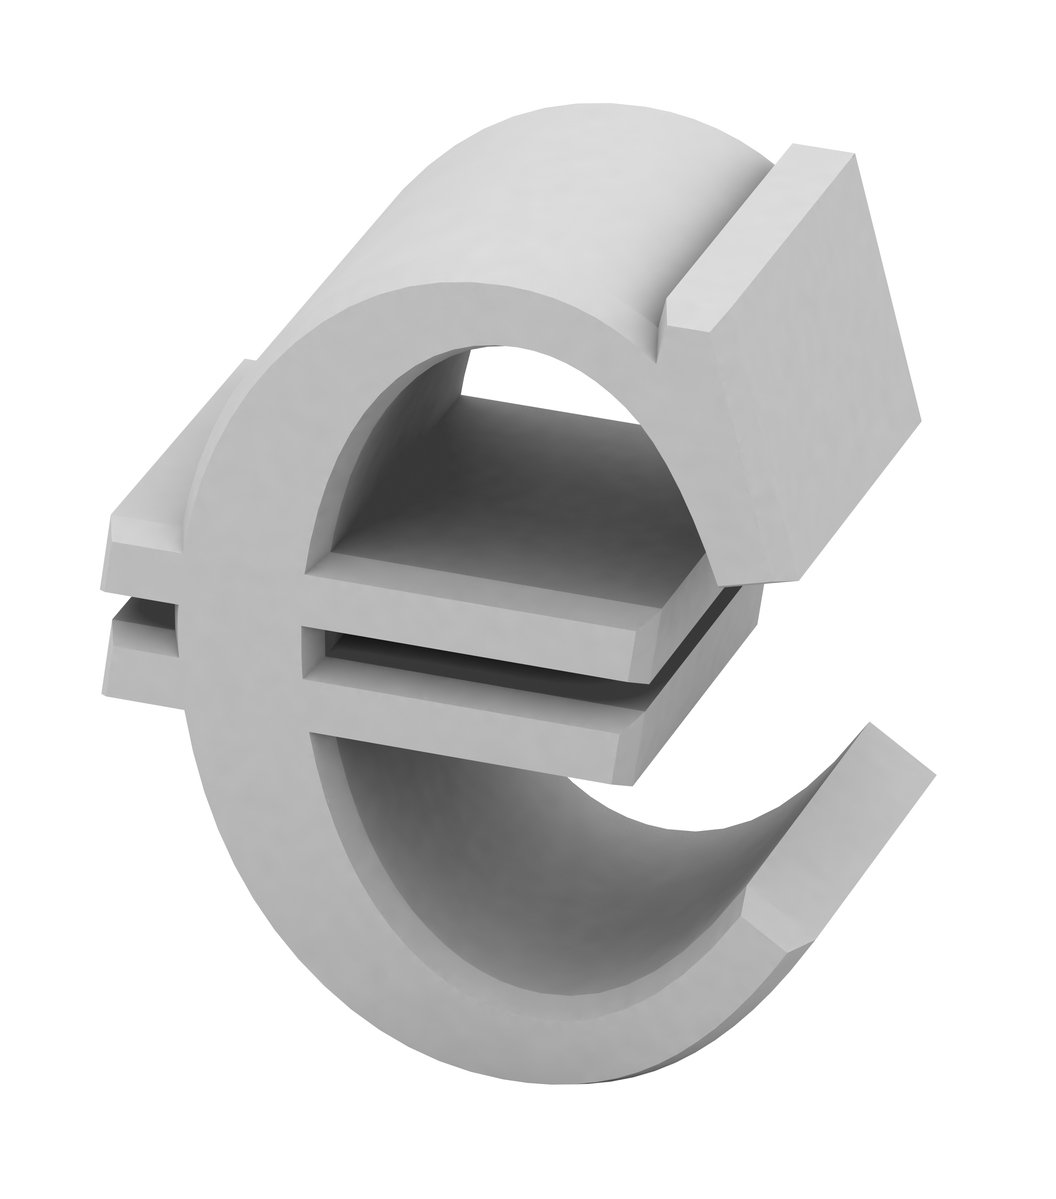 Fitness Center Rules Aluminum Sign Square Shape Free: Free Finance Symbols 3 Stock Photo